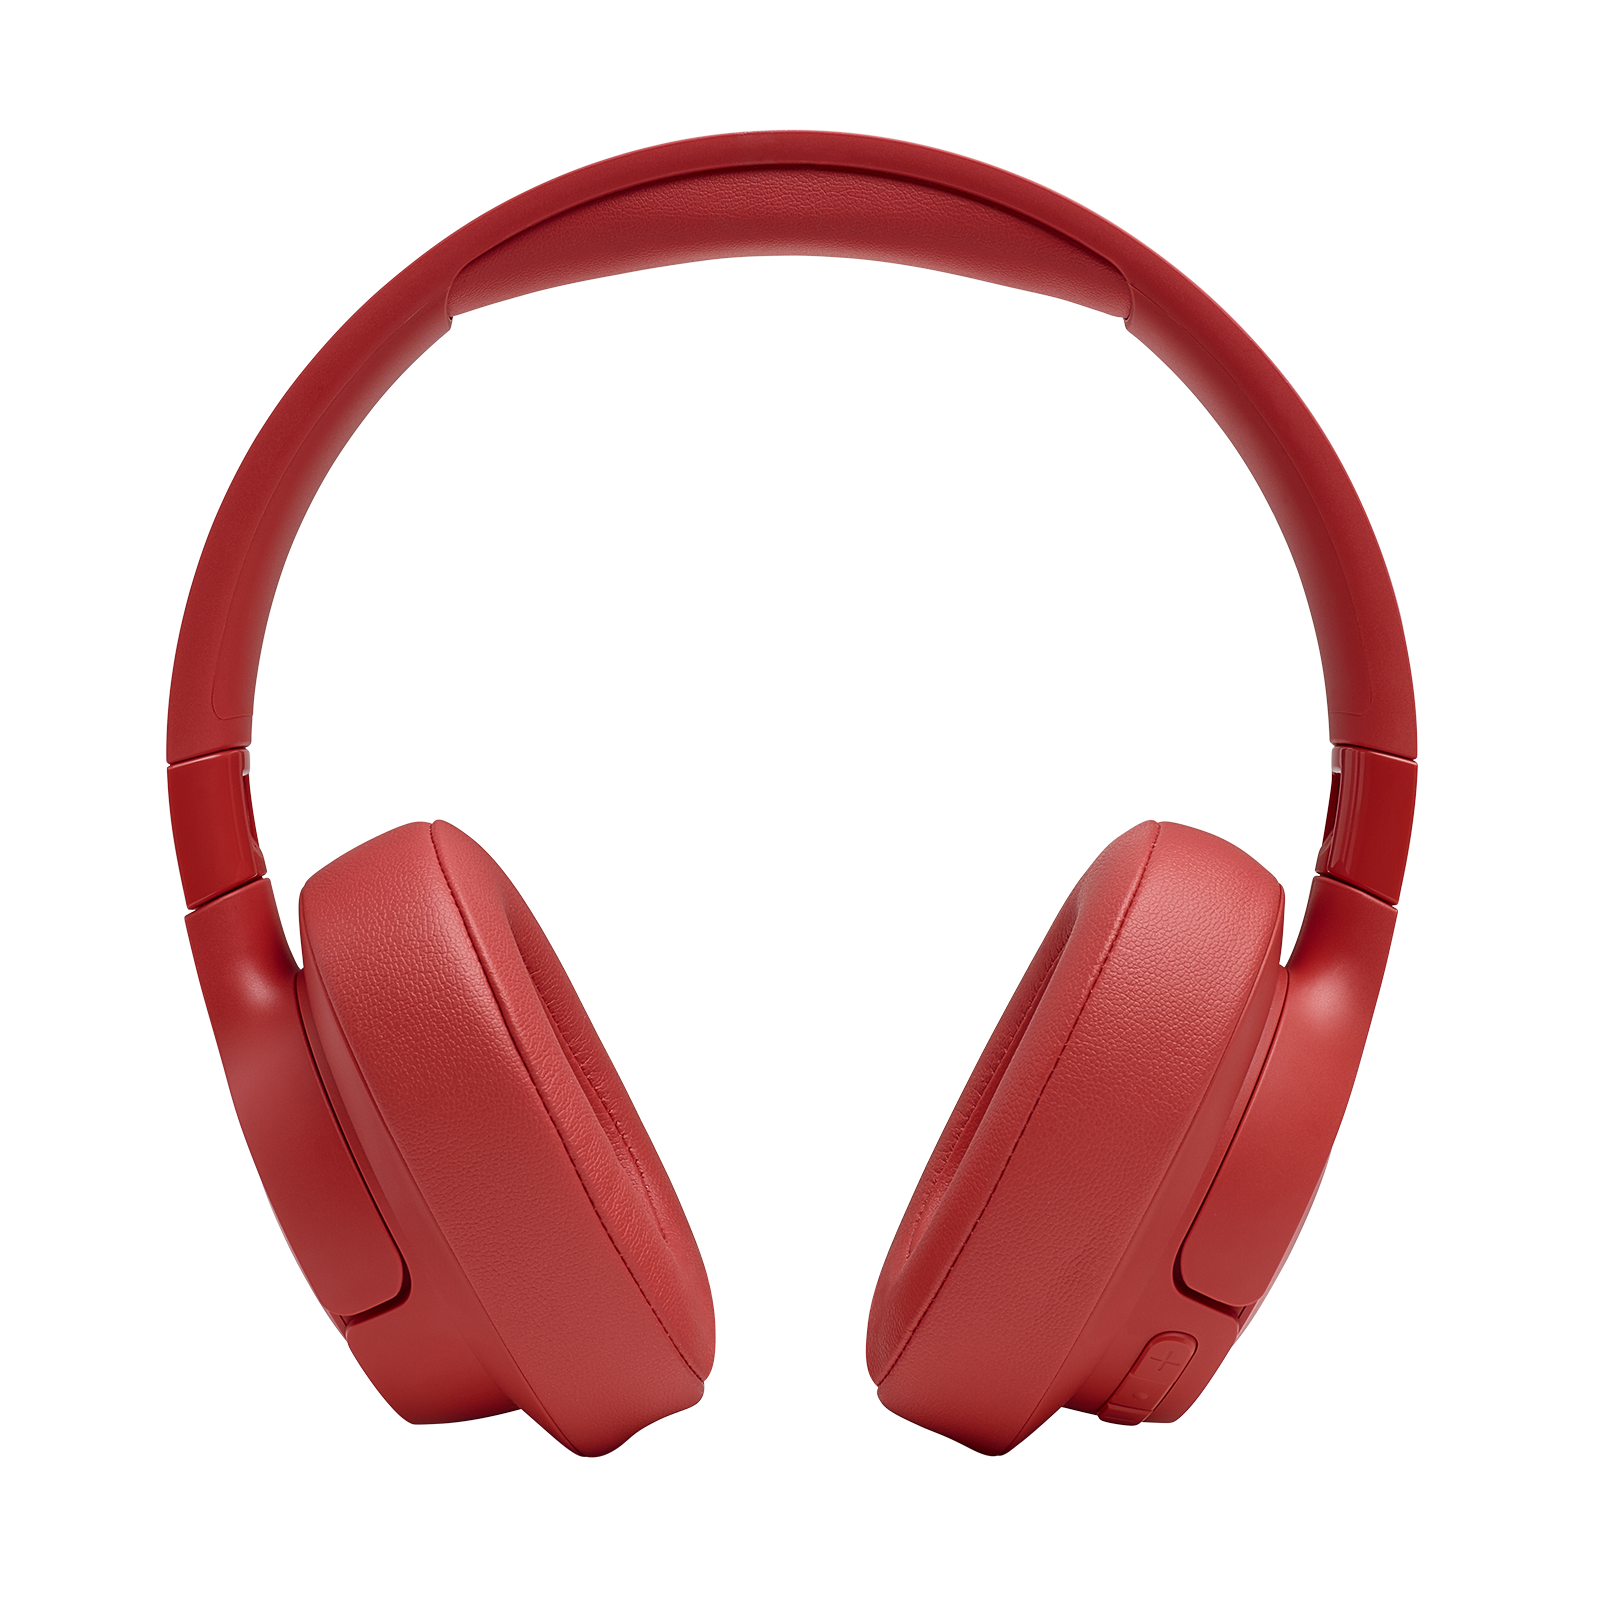 JBL TUNE 700BT - Coral - Wireless Over-Ear Headphones - Detailshot 5